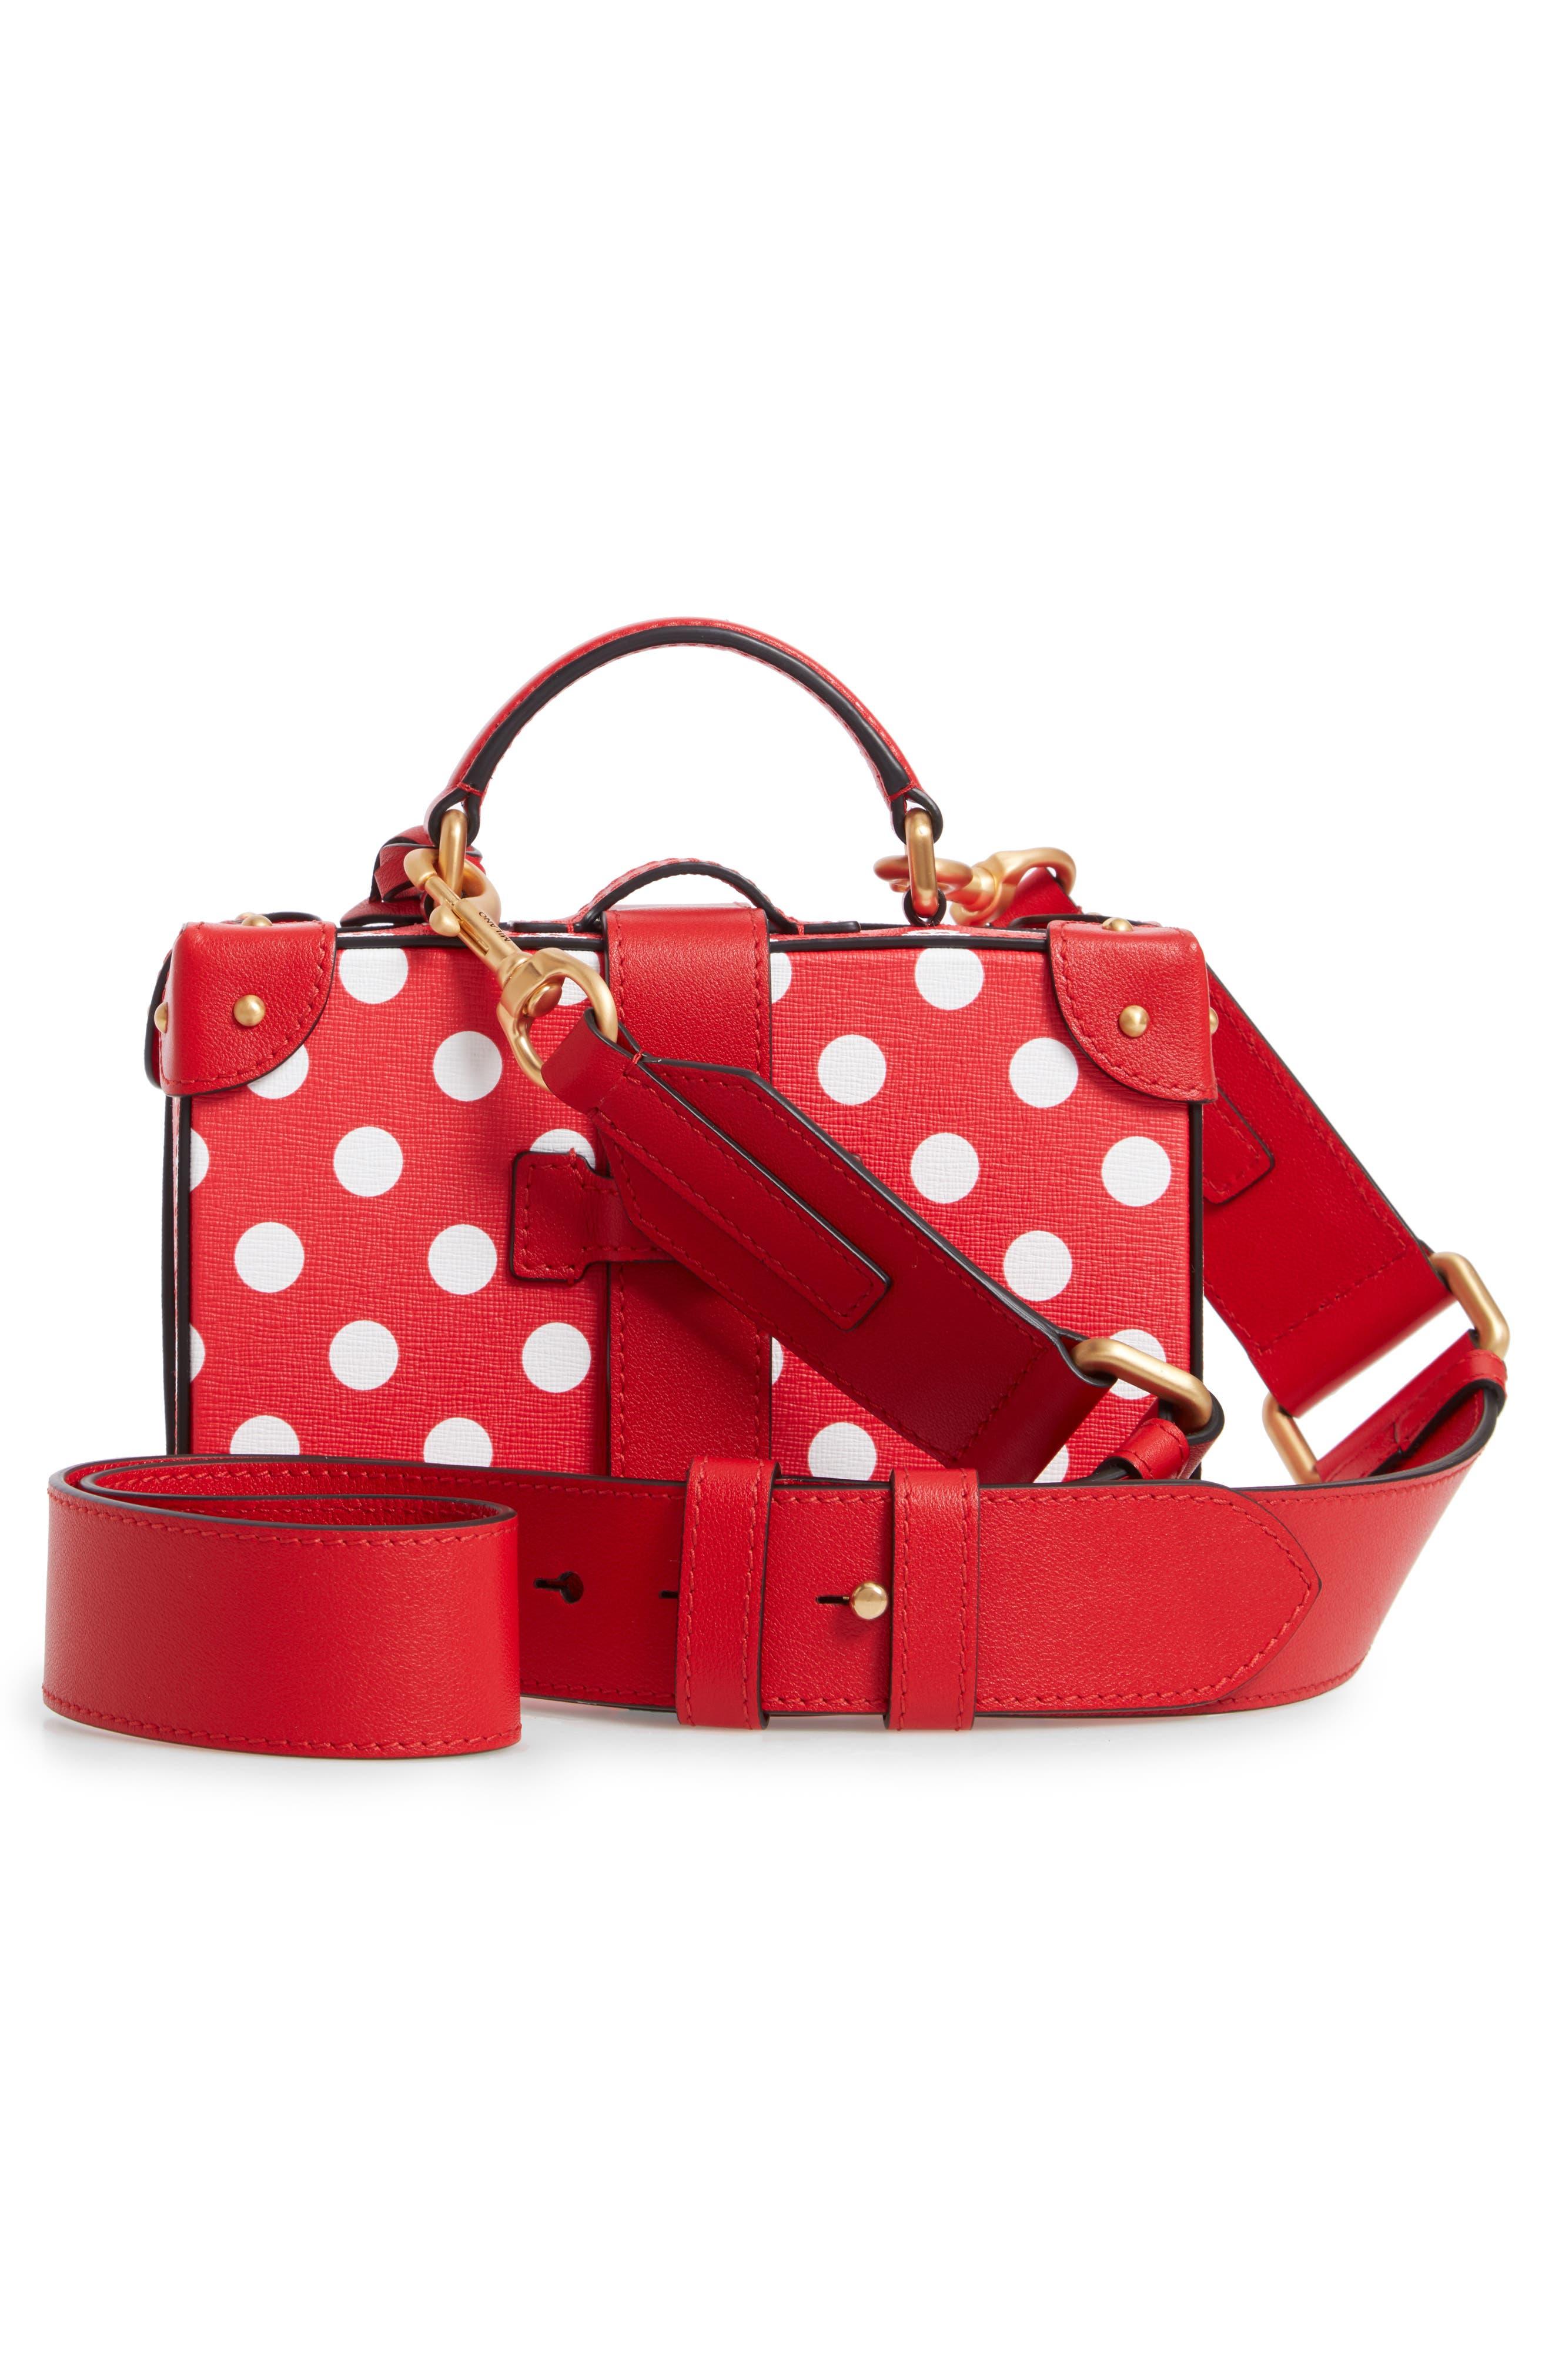 MOSCHINO, Polka Dot Box Leather Crossbody Bag, Alternate thumbnail 3, color, RED